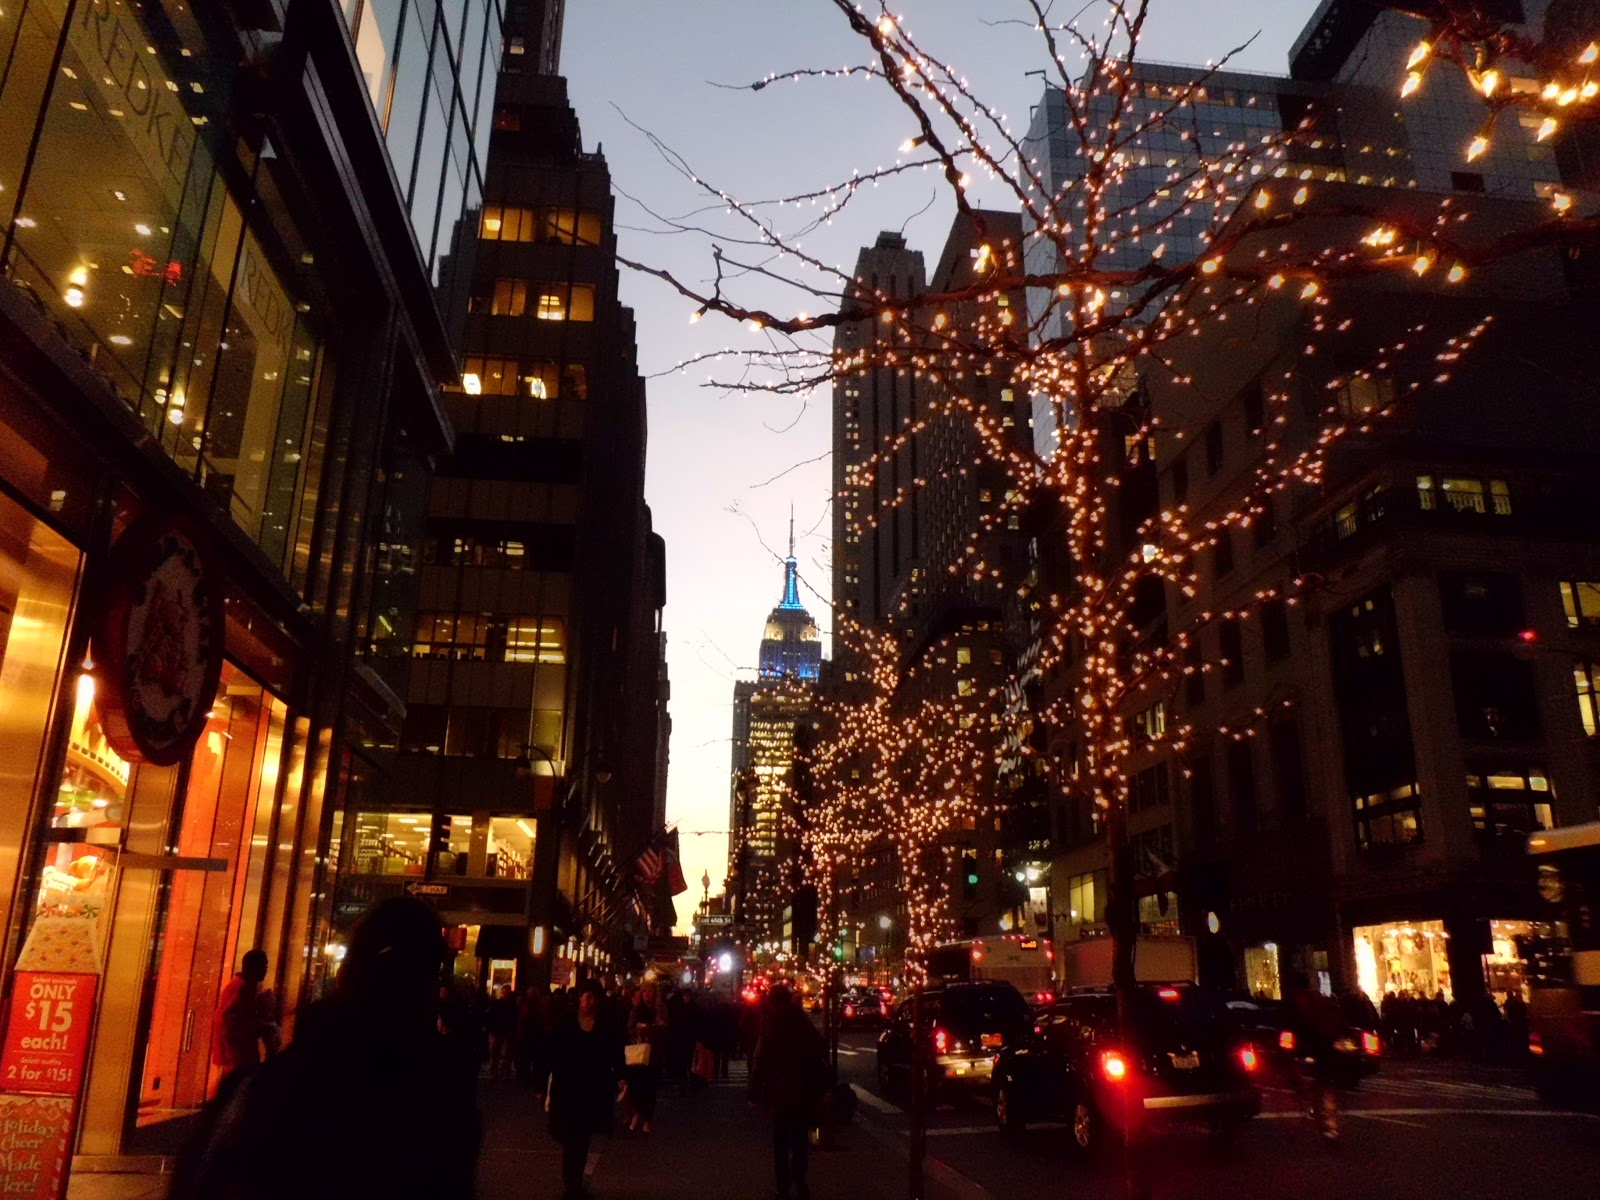 New York City Christmas 3 Hd Wallpaper   Hivewallpapercom 1600x1200